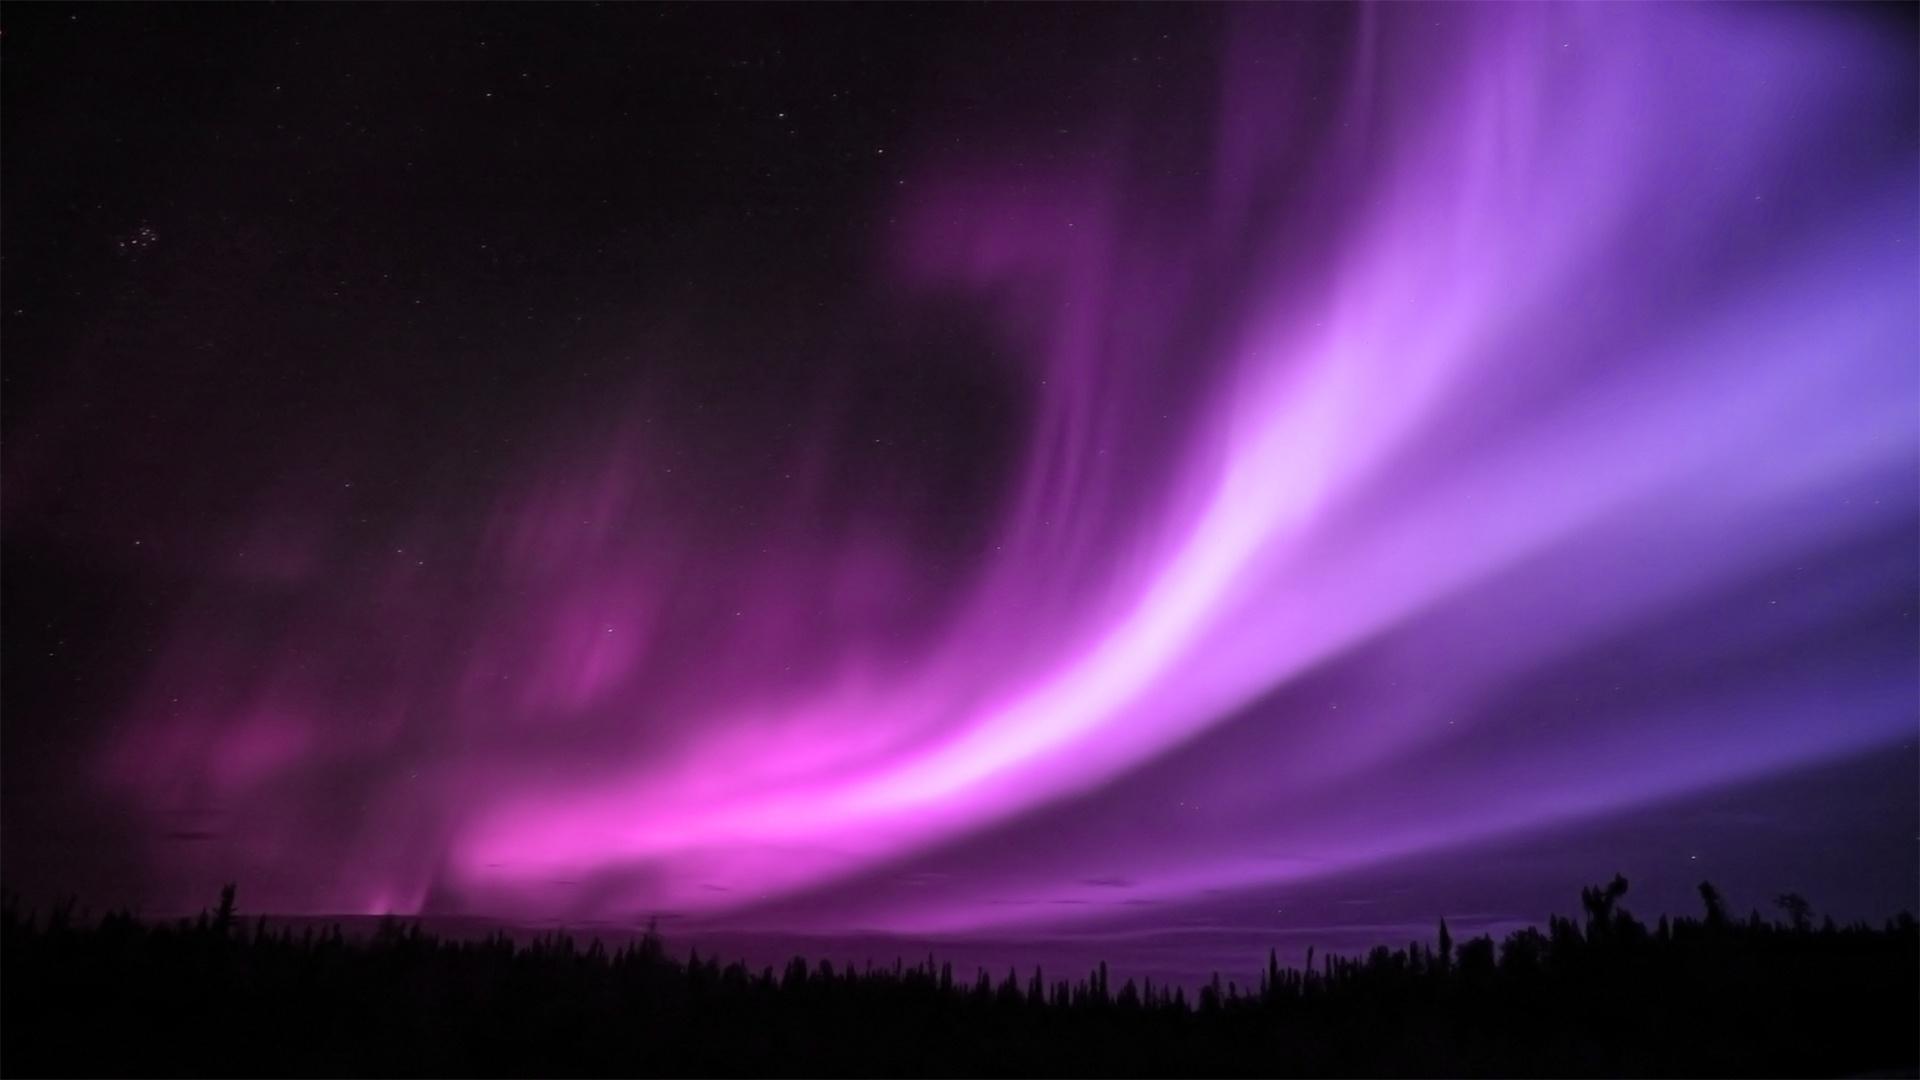 Purple Aurora Borealis Wallpapers | HD Wallpapers